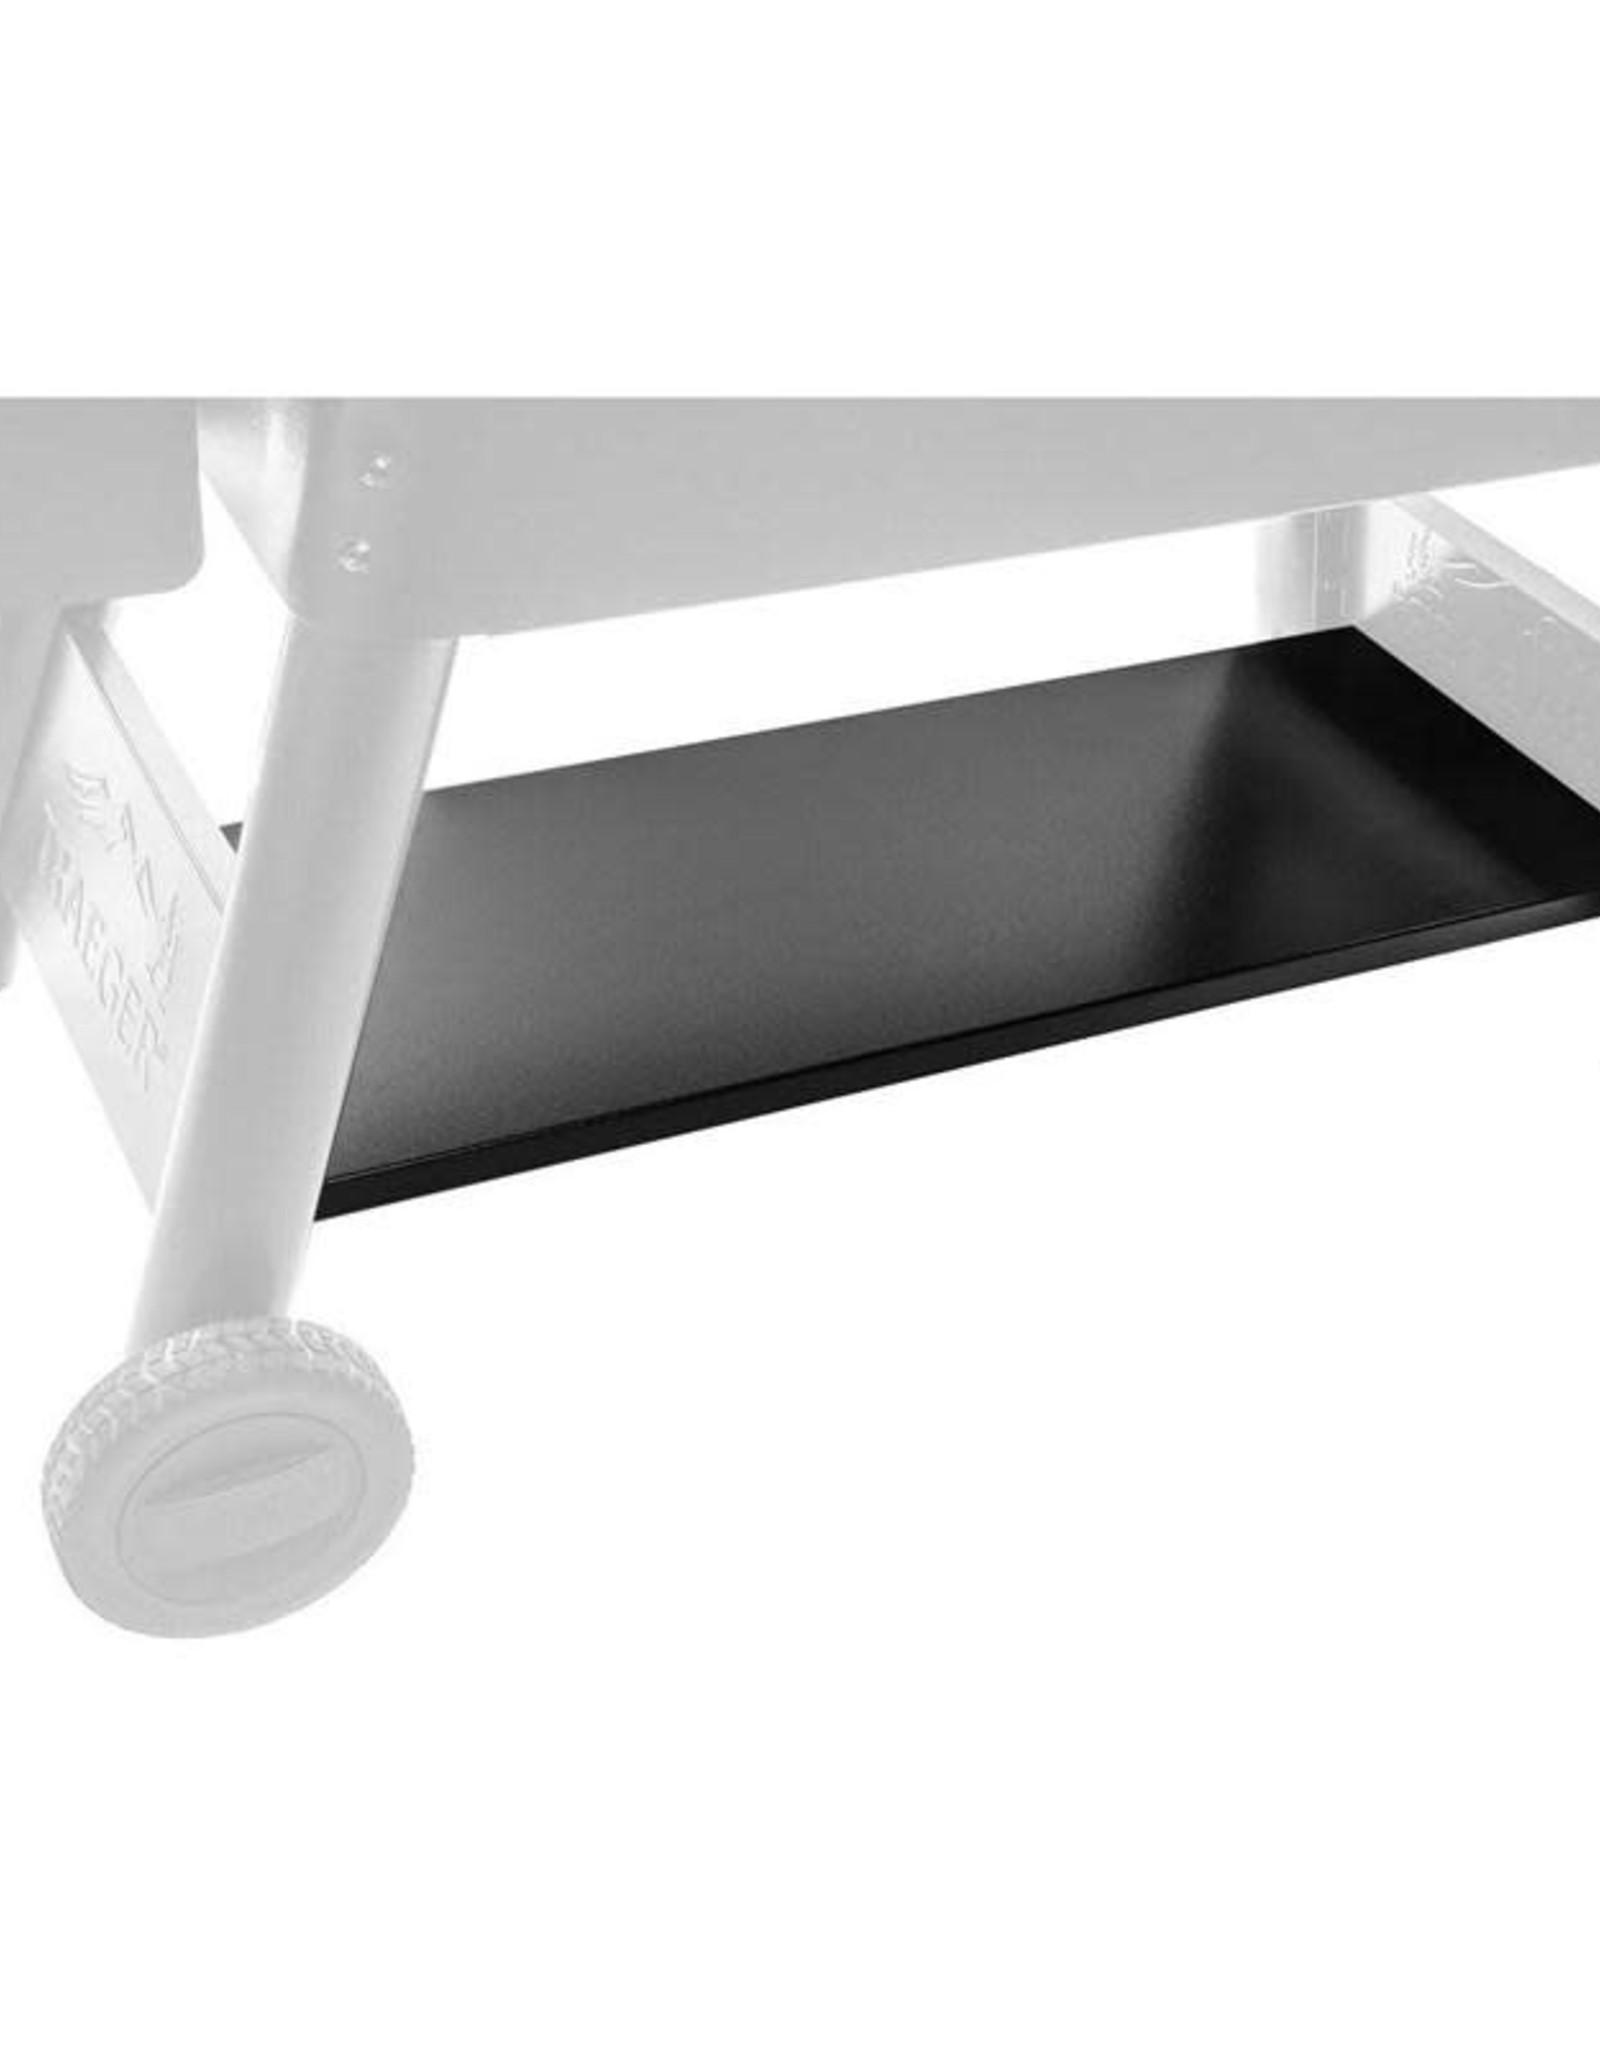 Traeger Traeger Pro Series 22 Bottom Shelf - BAC378